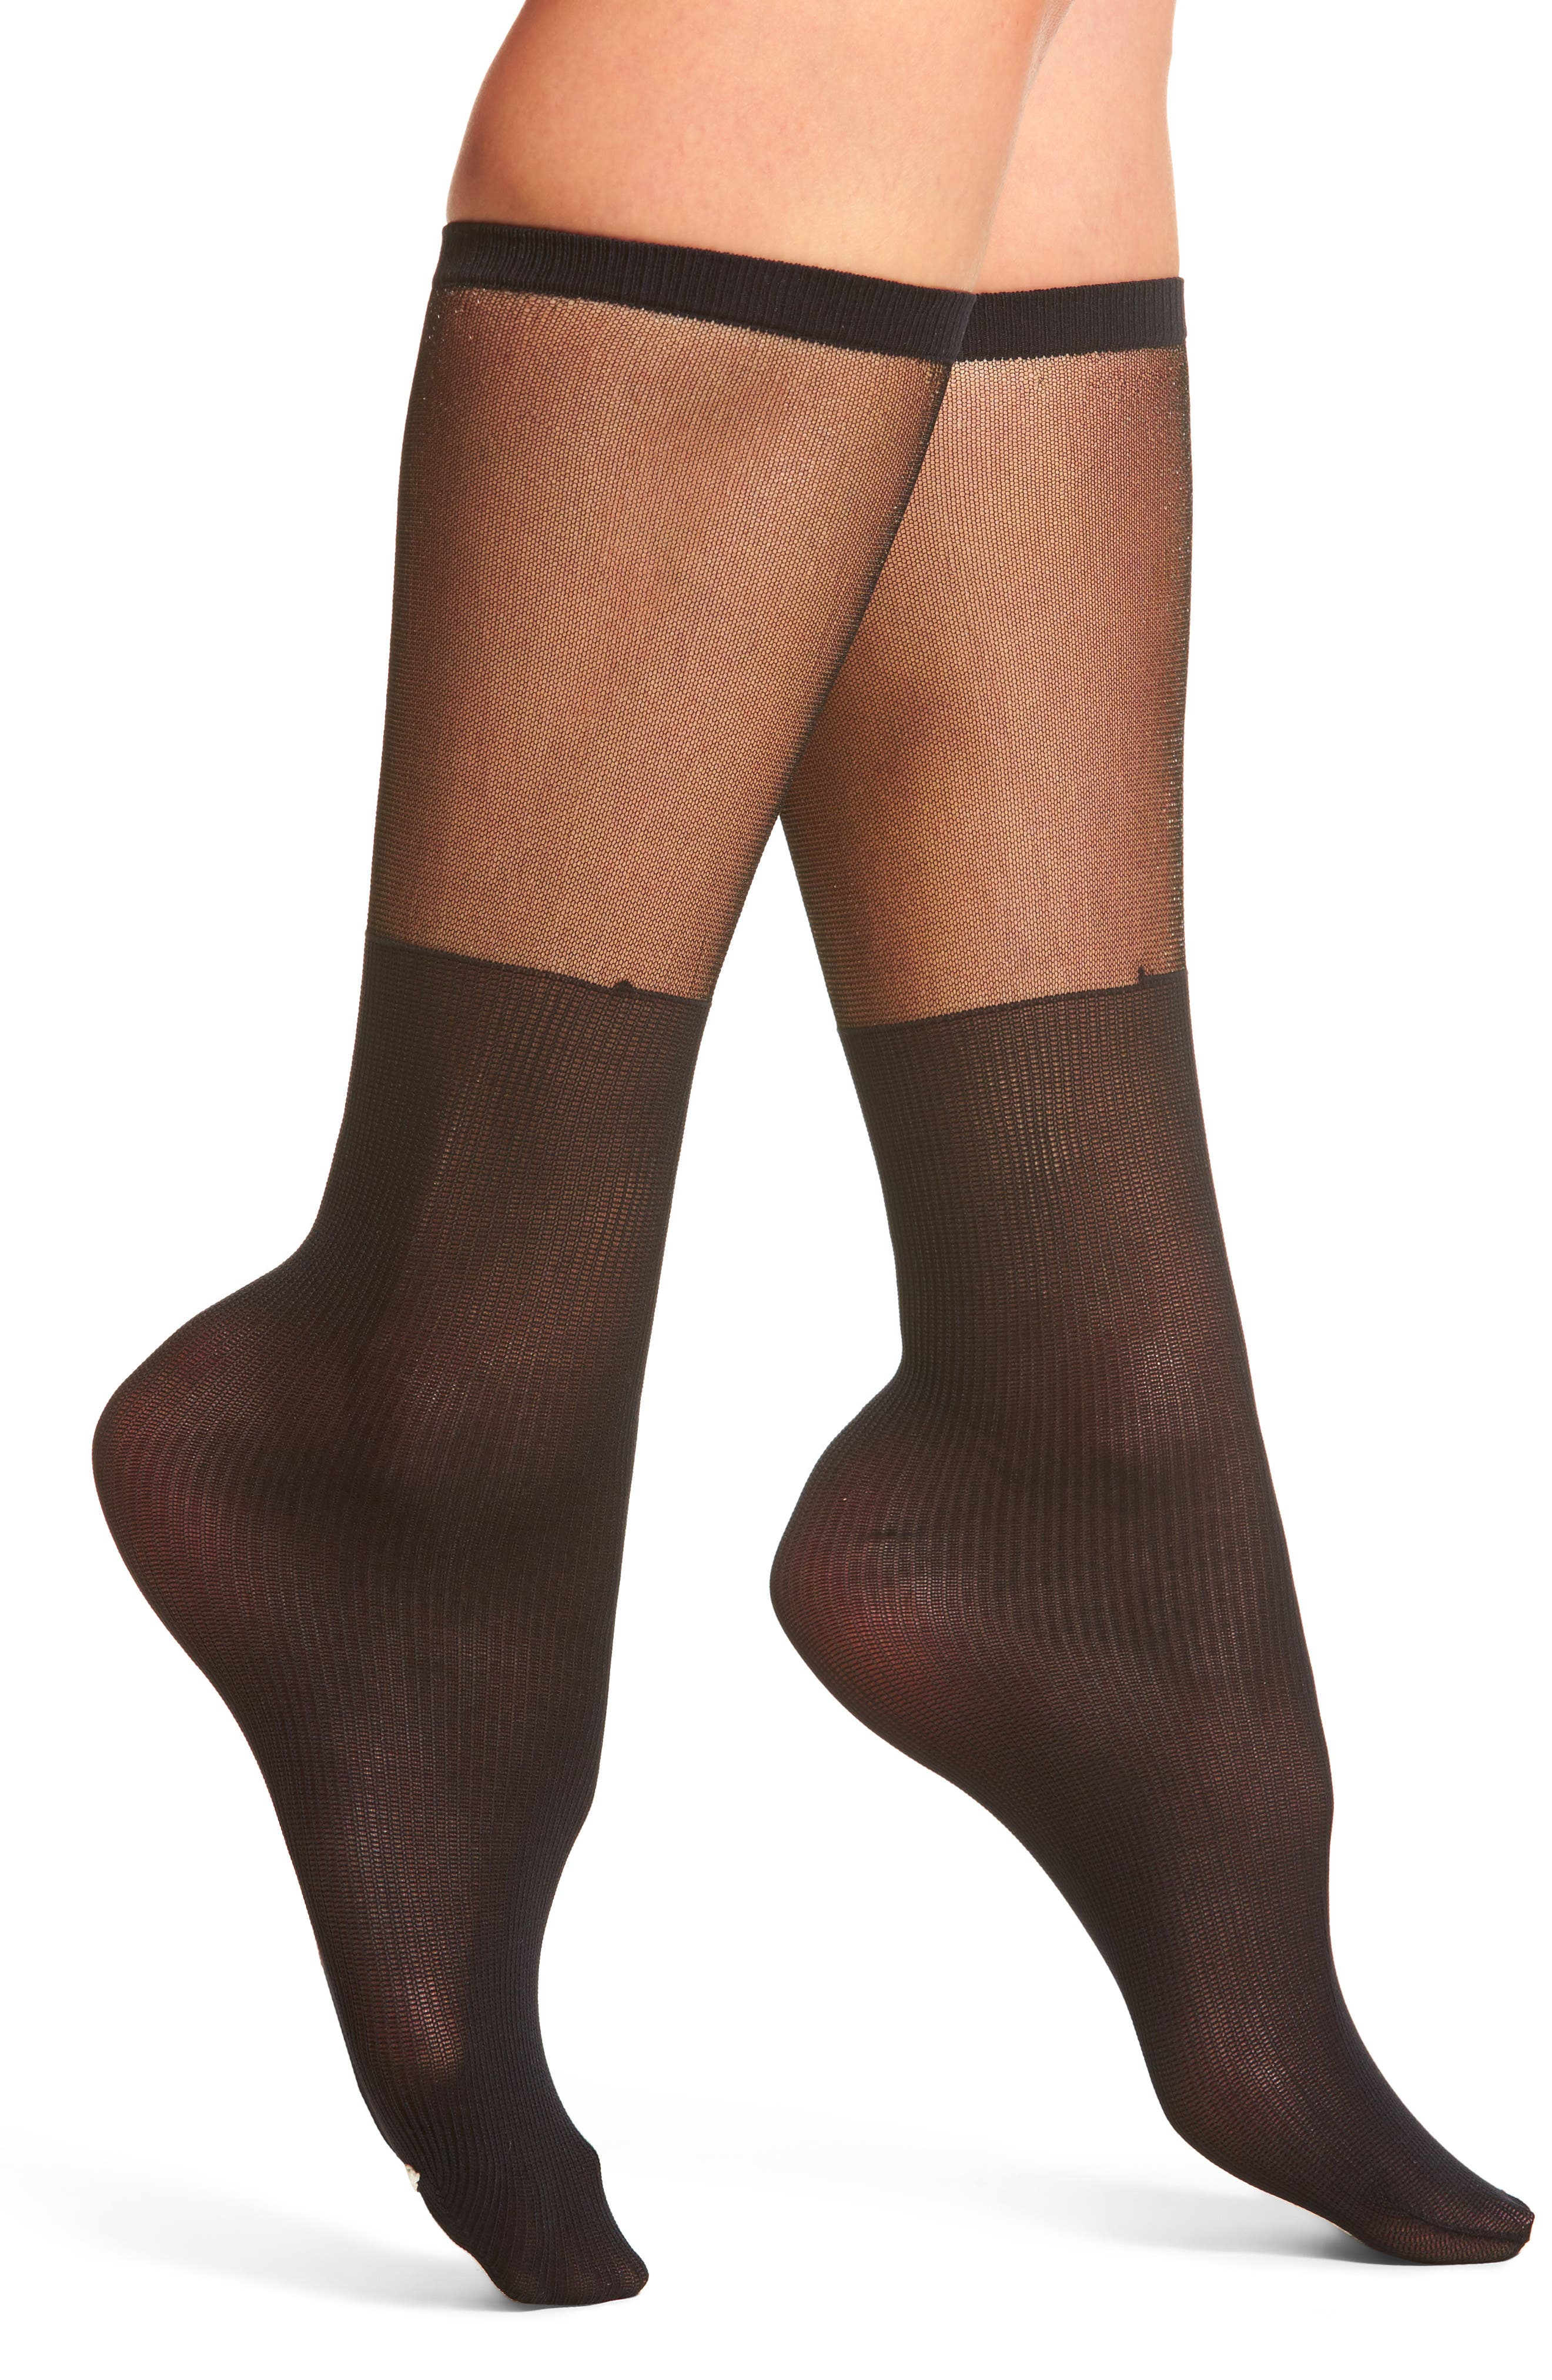 Marilu Socks,                         Main,                         color, Black